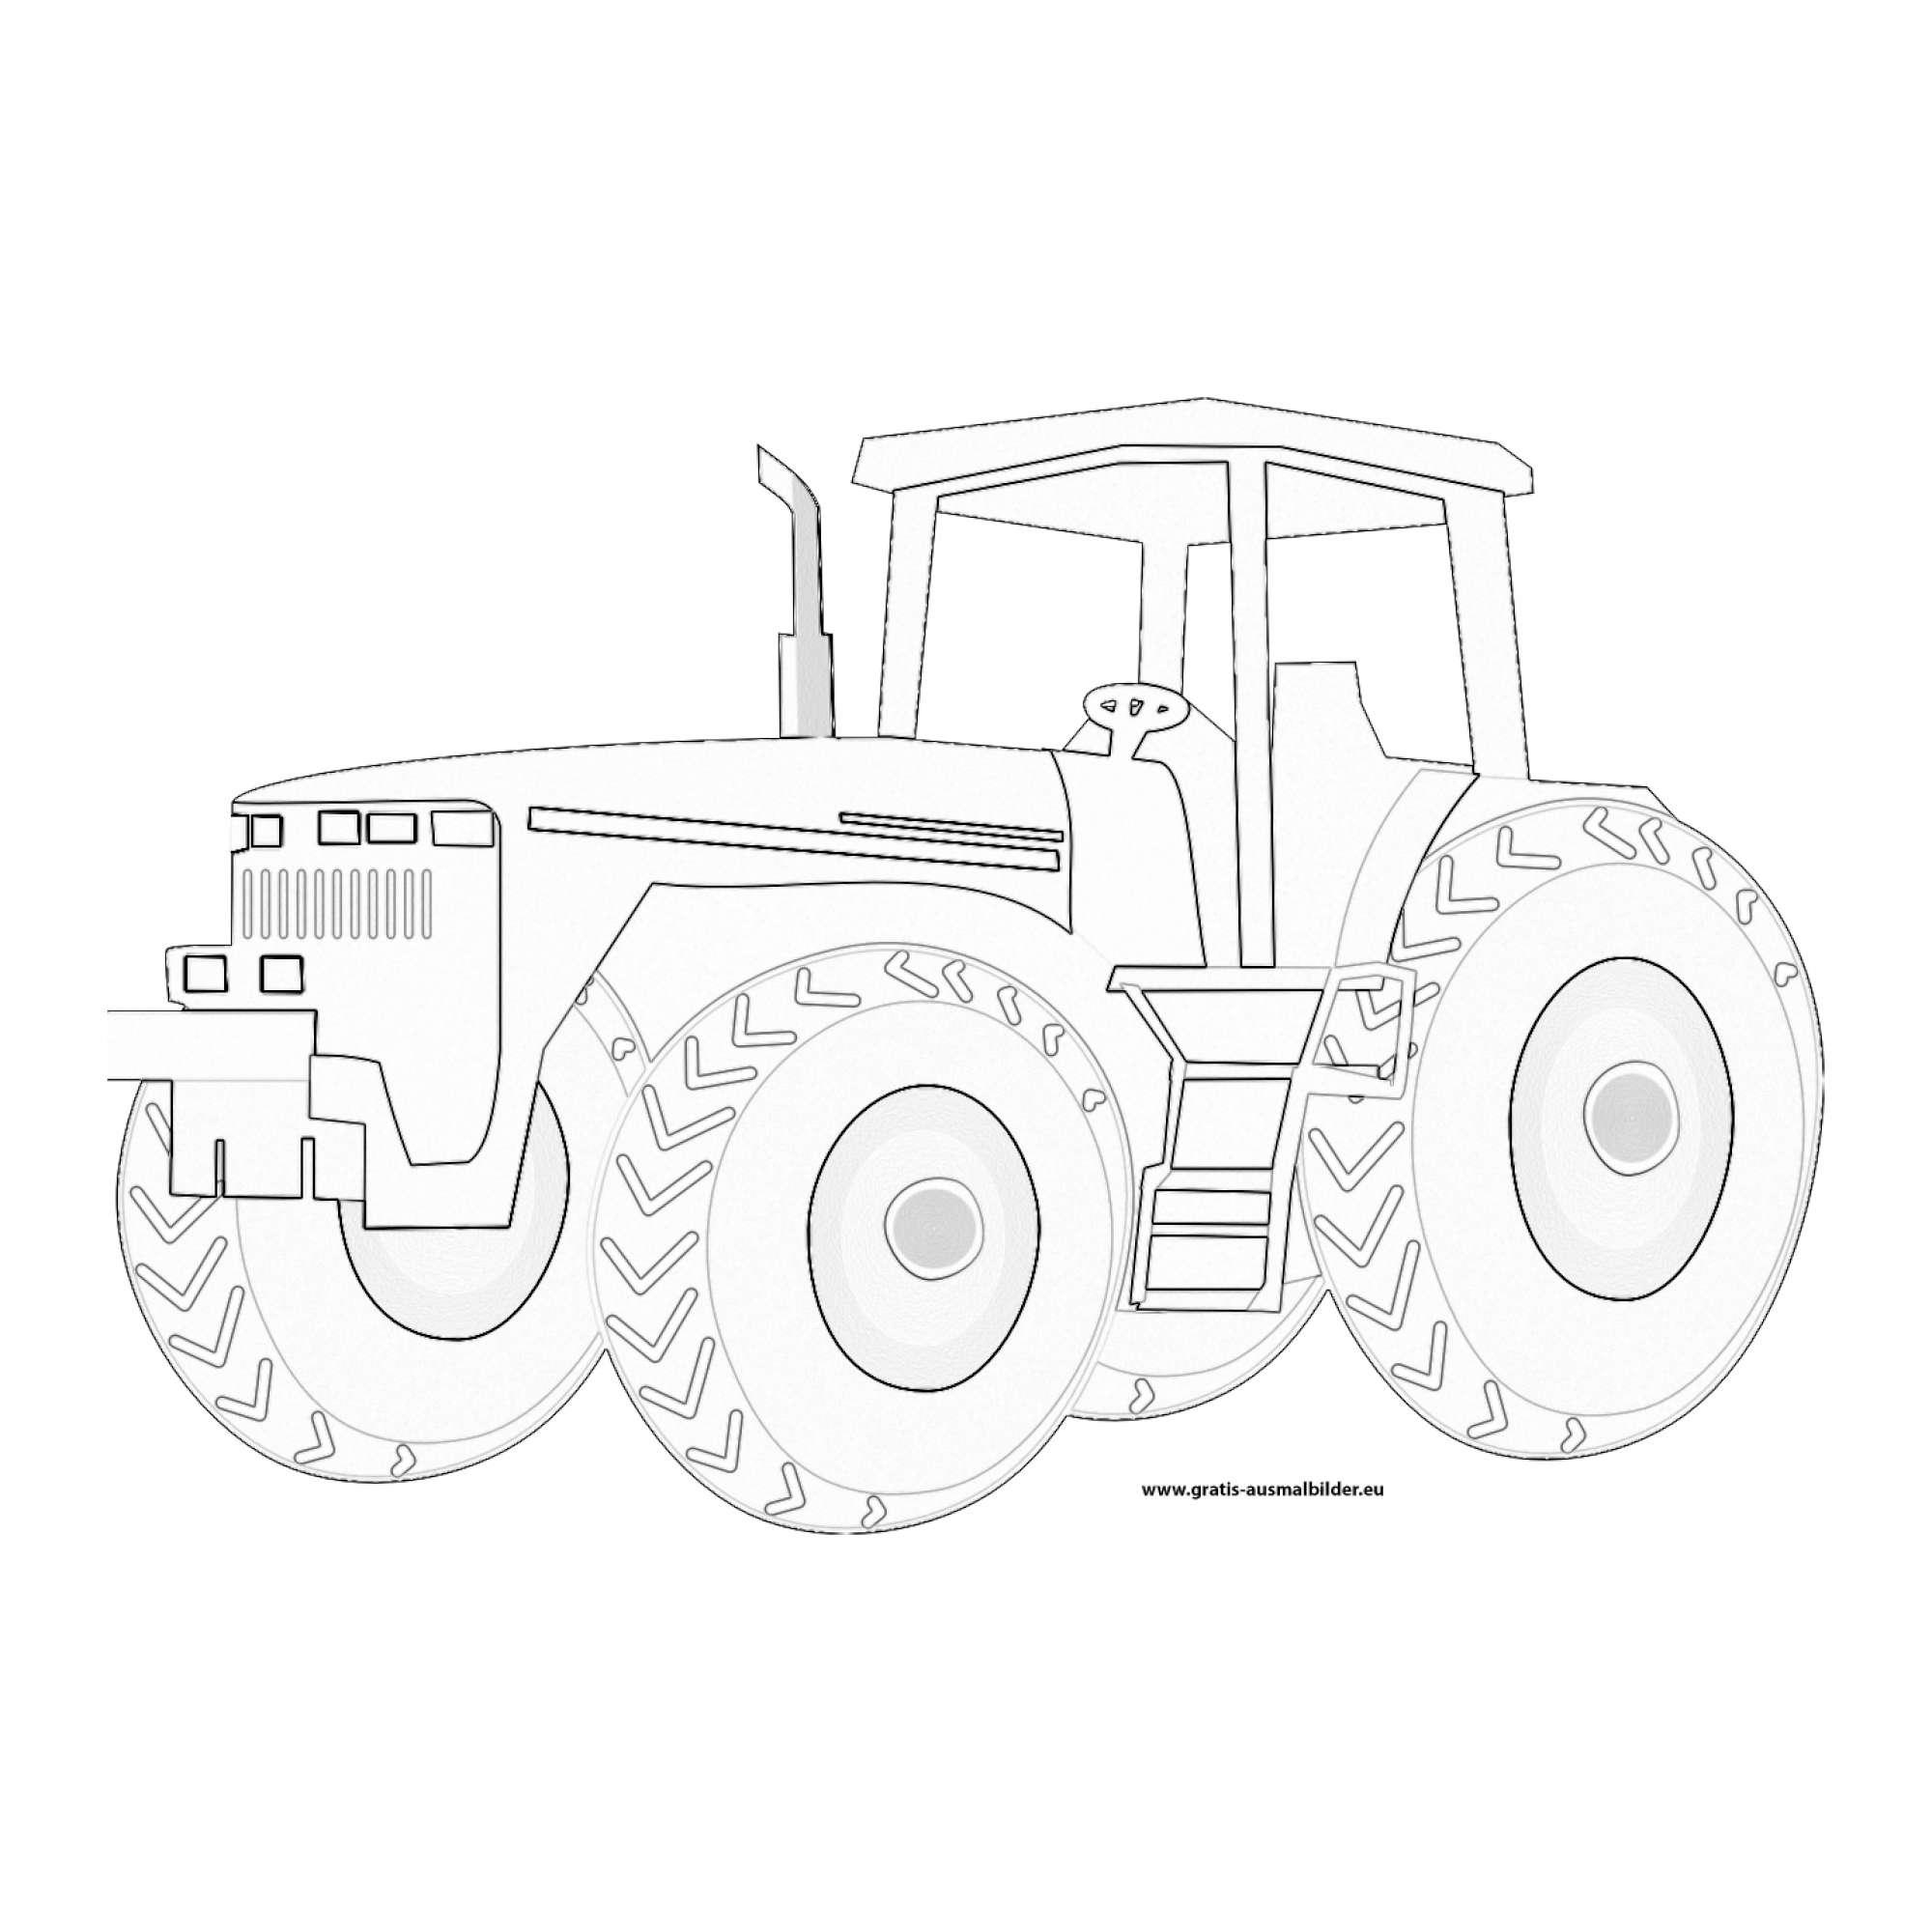 Traktor Gratis Ausmalbild